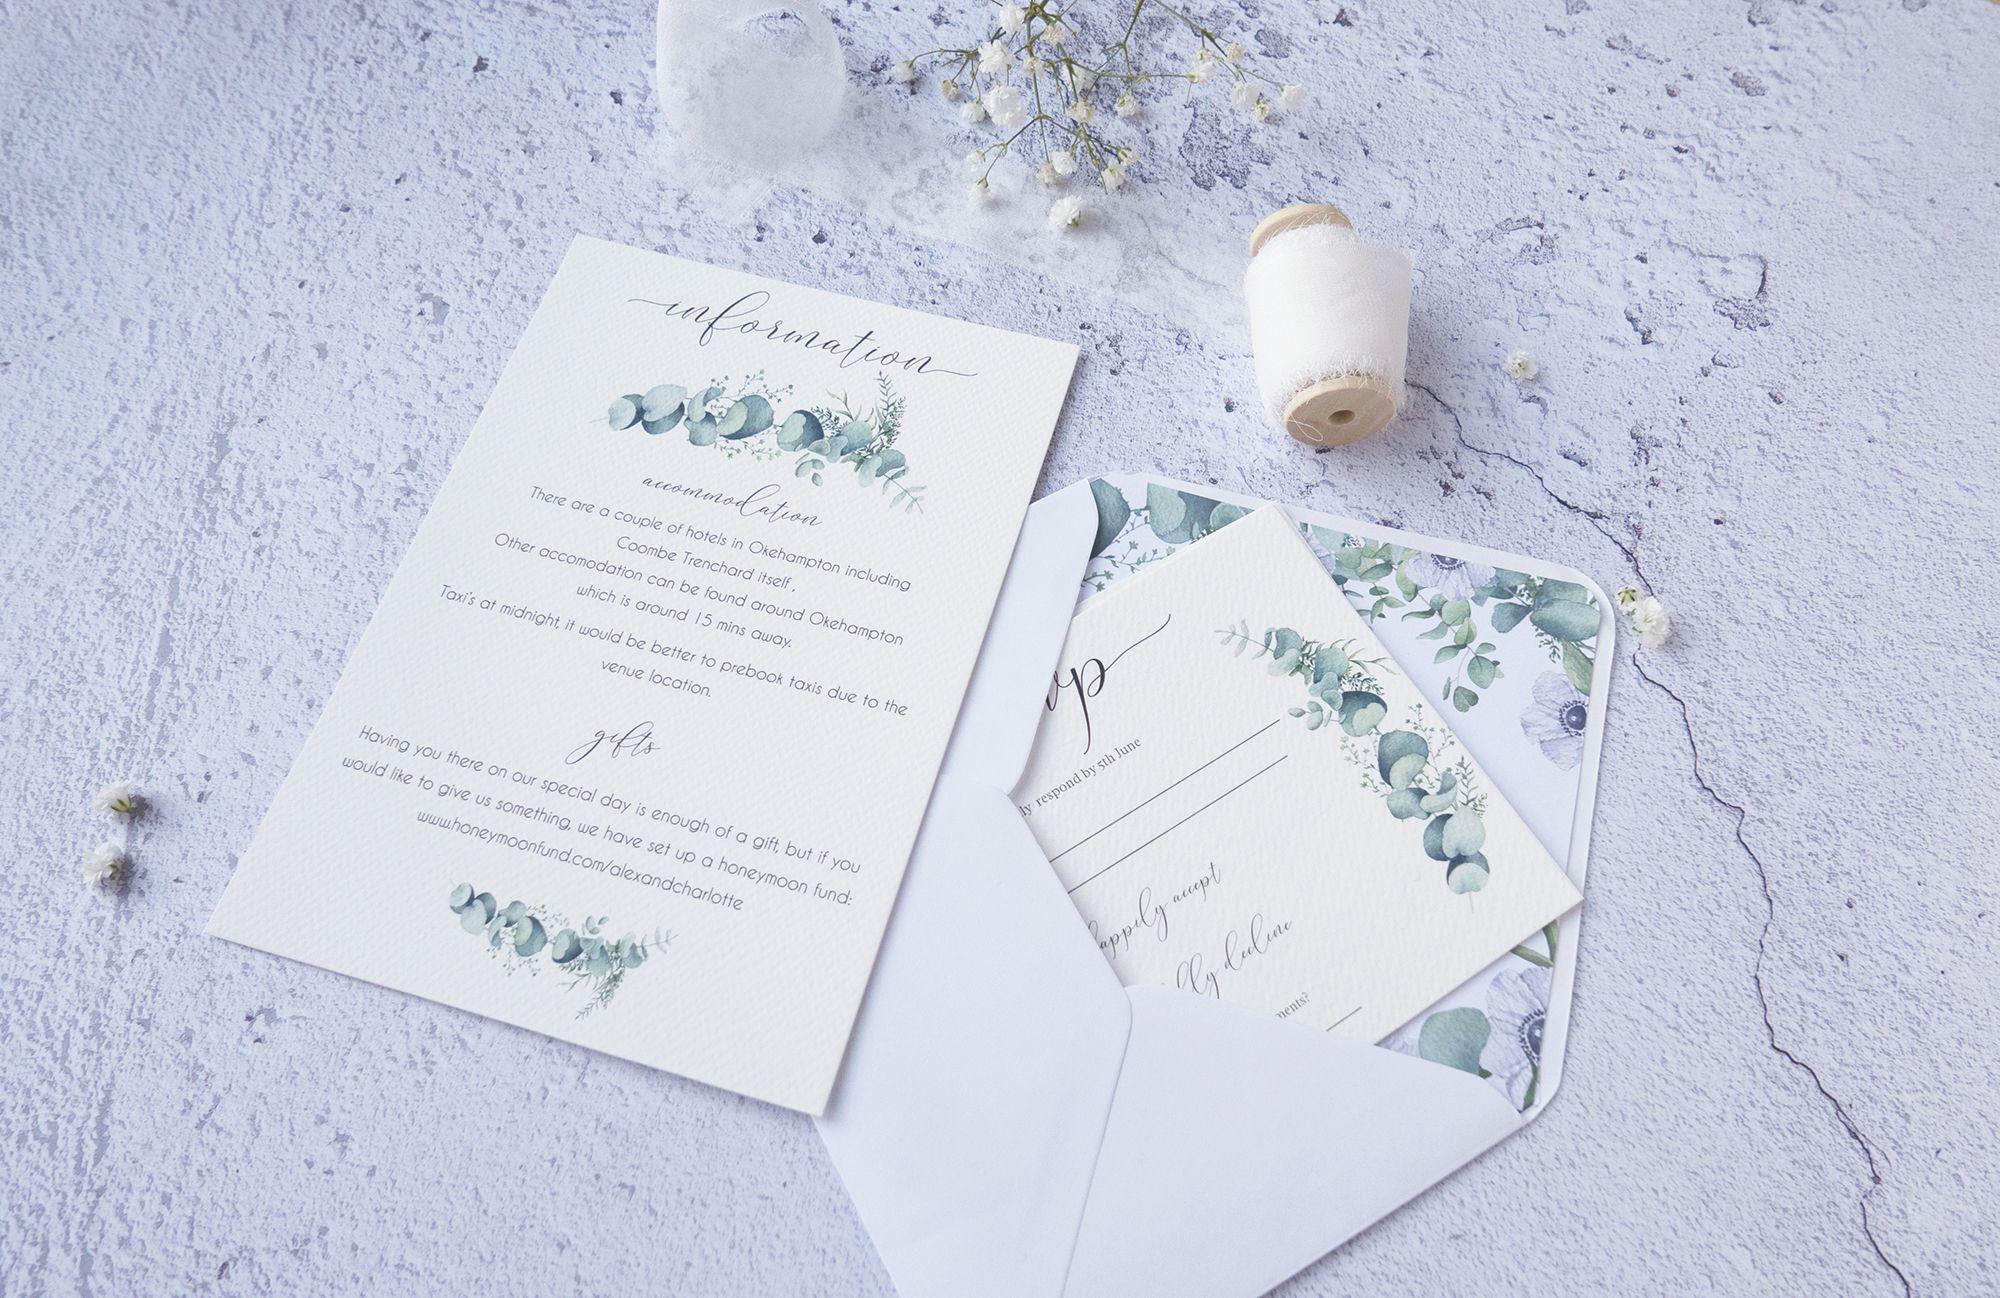 Eucalyptus Wedding Invitation Details Card And Rsvp Wedding Invitation Details Card Wedding Invitations Wedding Invitation Suite